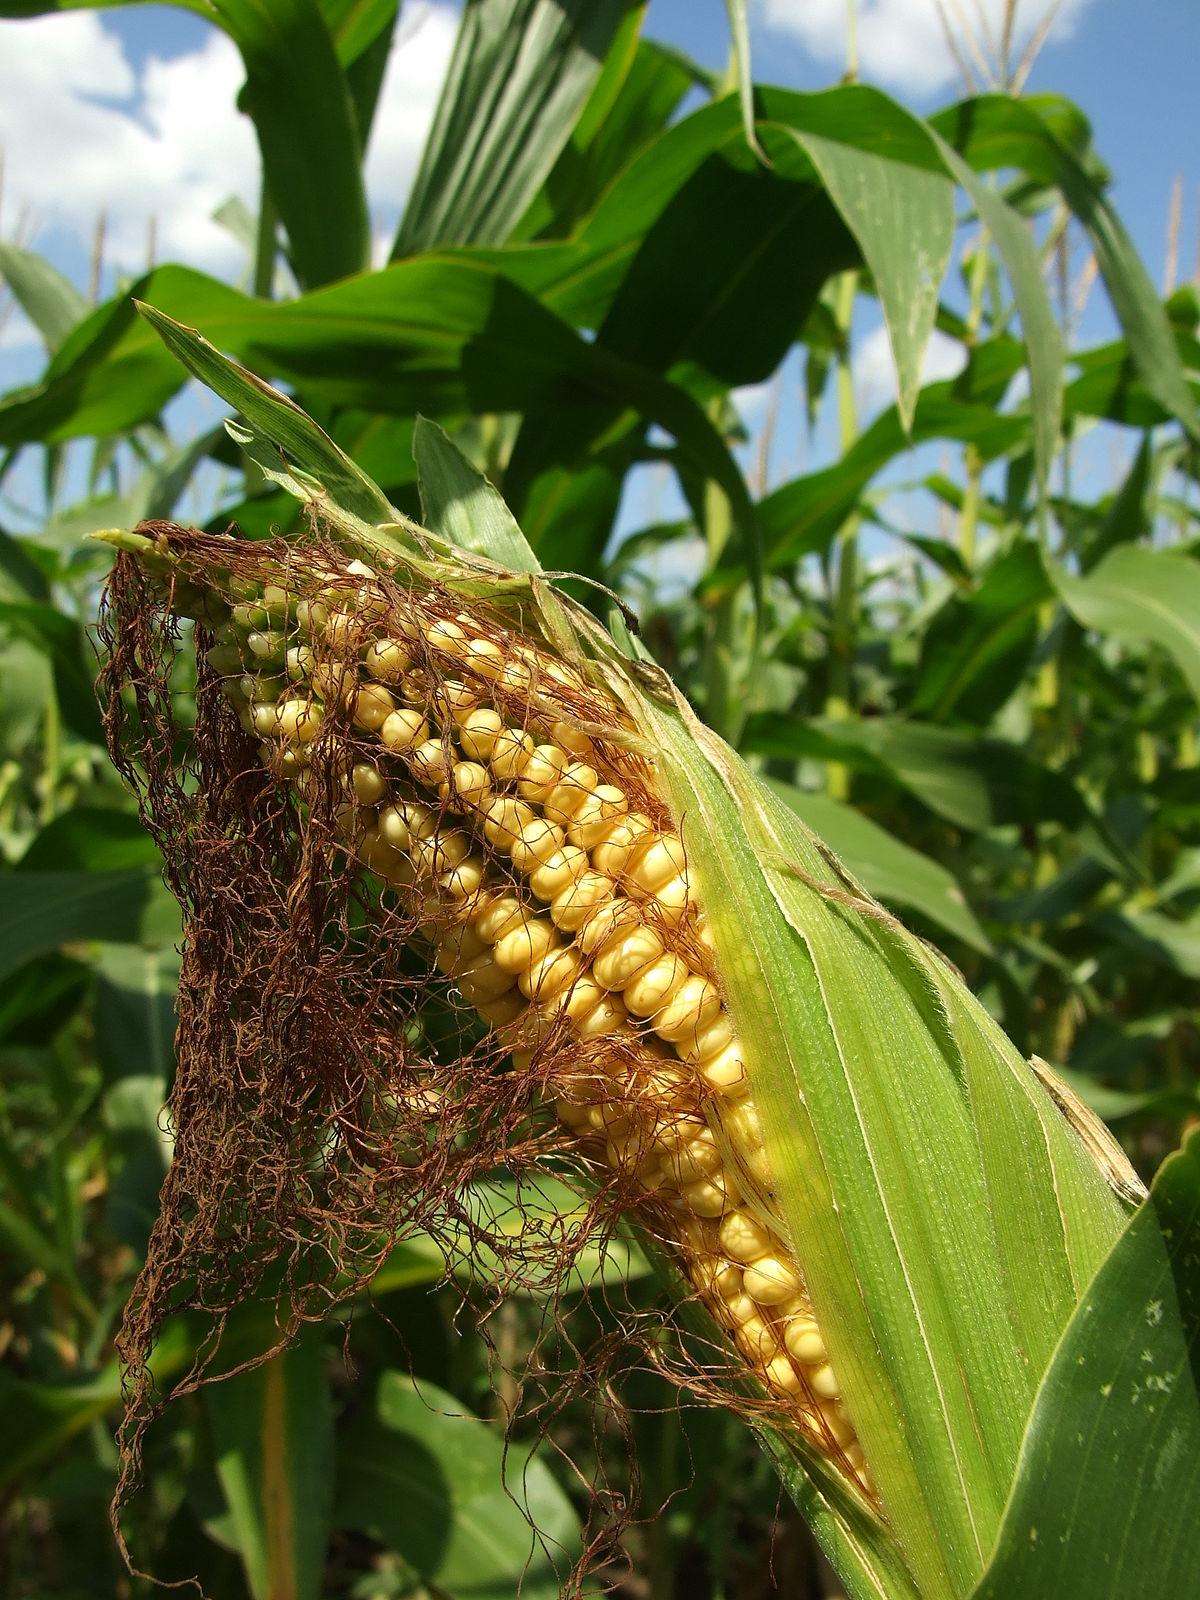 kukoricacső